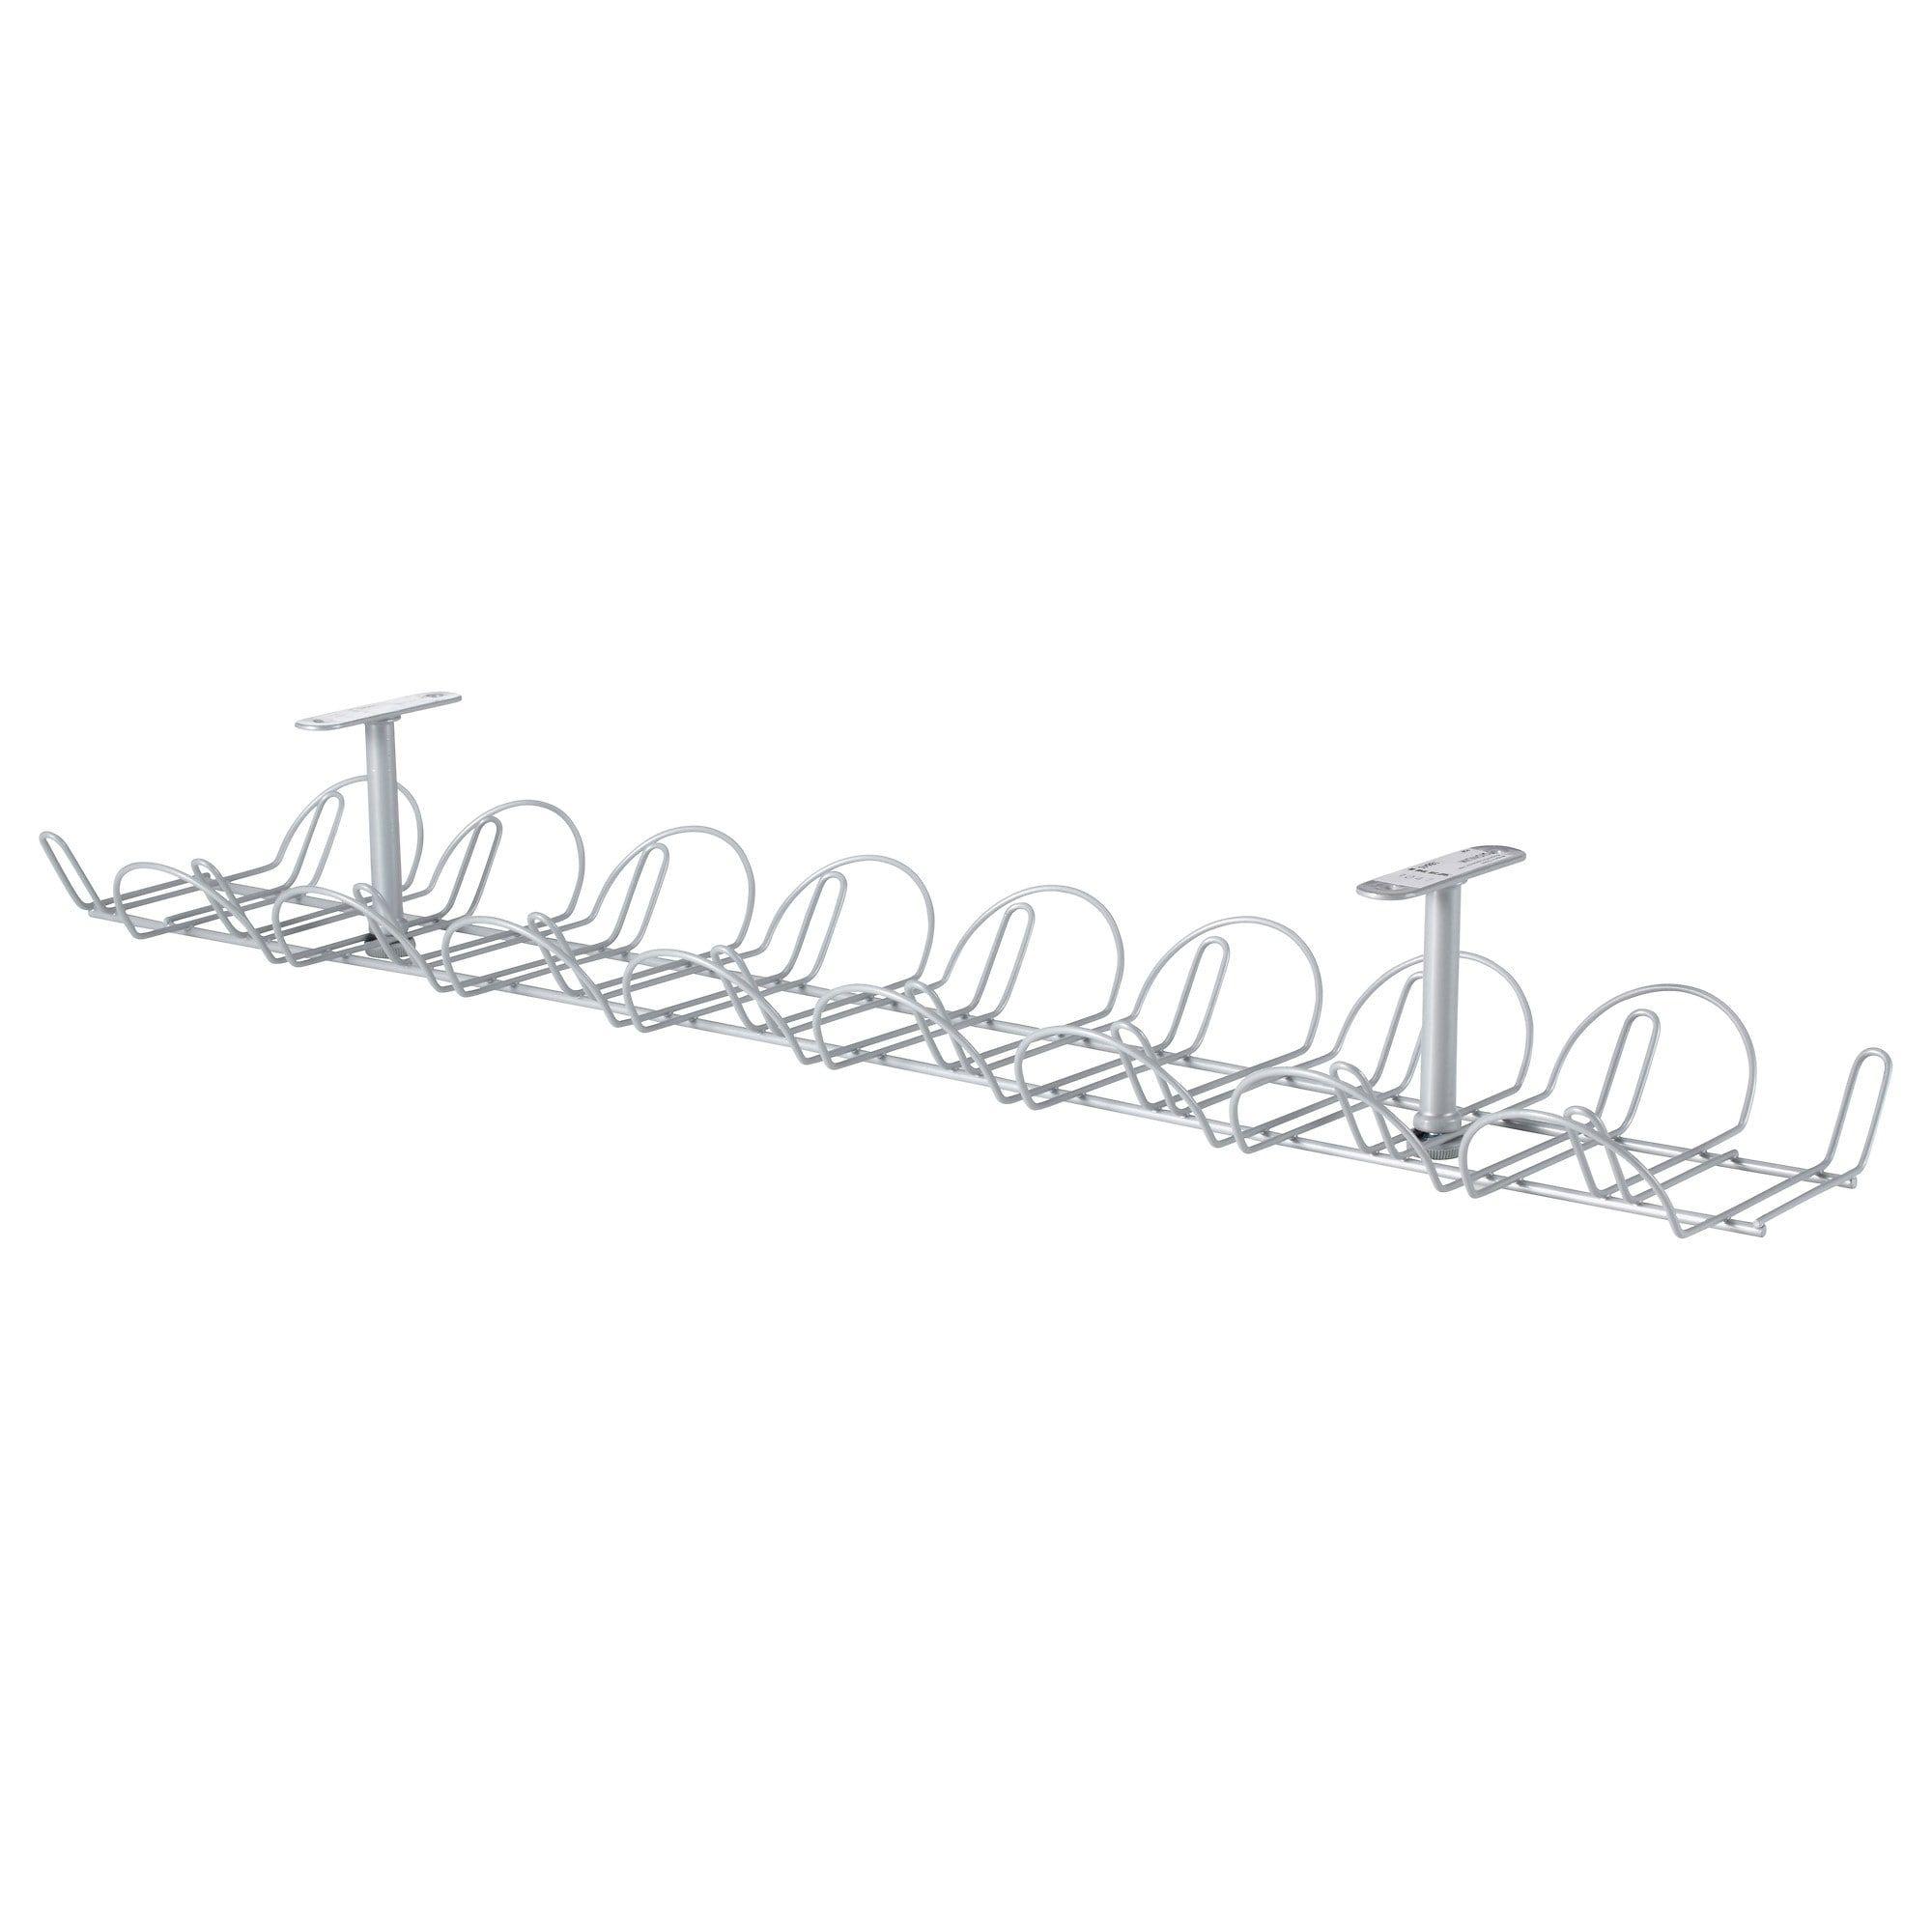 Ikea Signum Silver Color Cable Management Horizontal Cable Management Ikea Cable Organizer